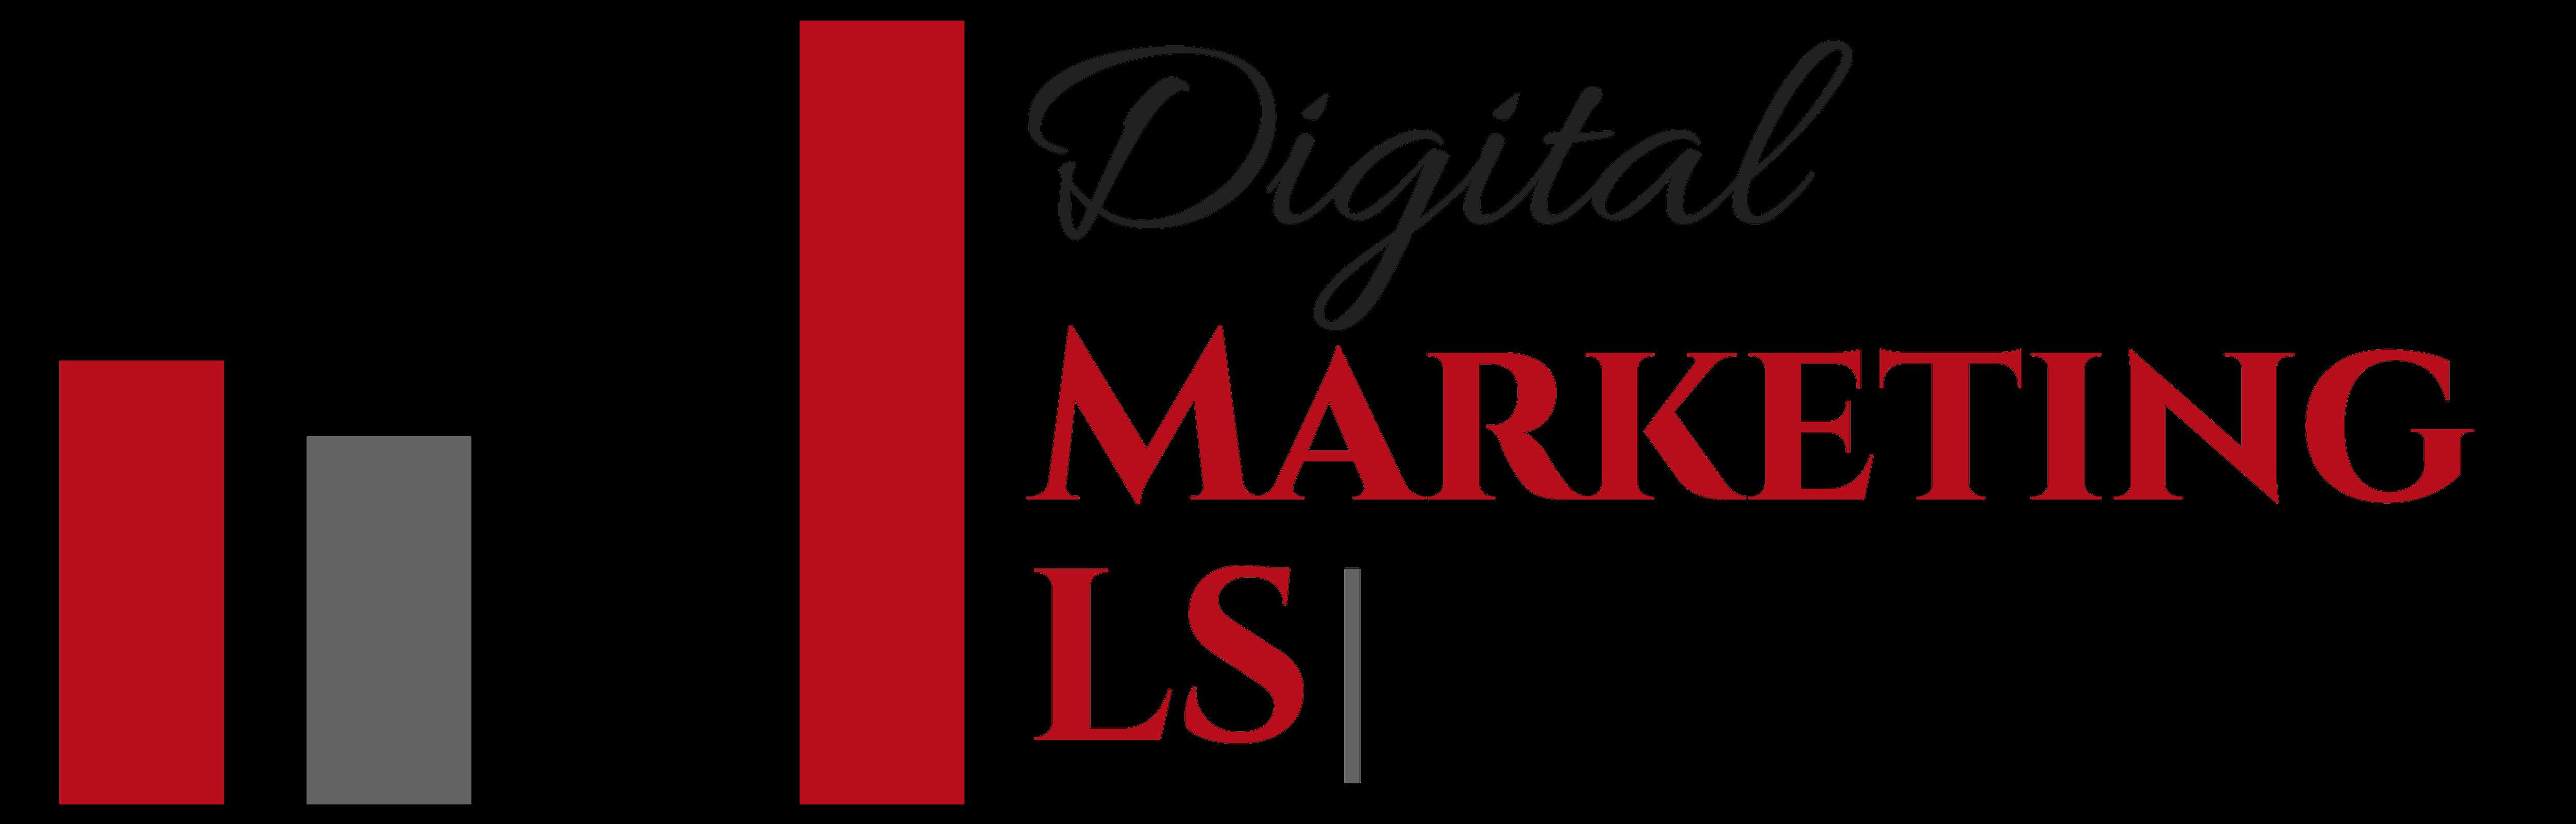 Digital Marketing LS|EG Workshops